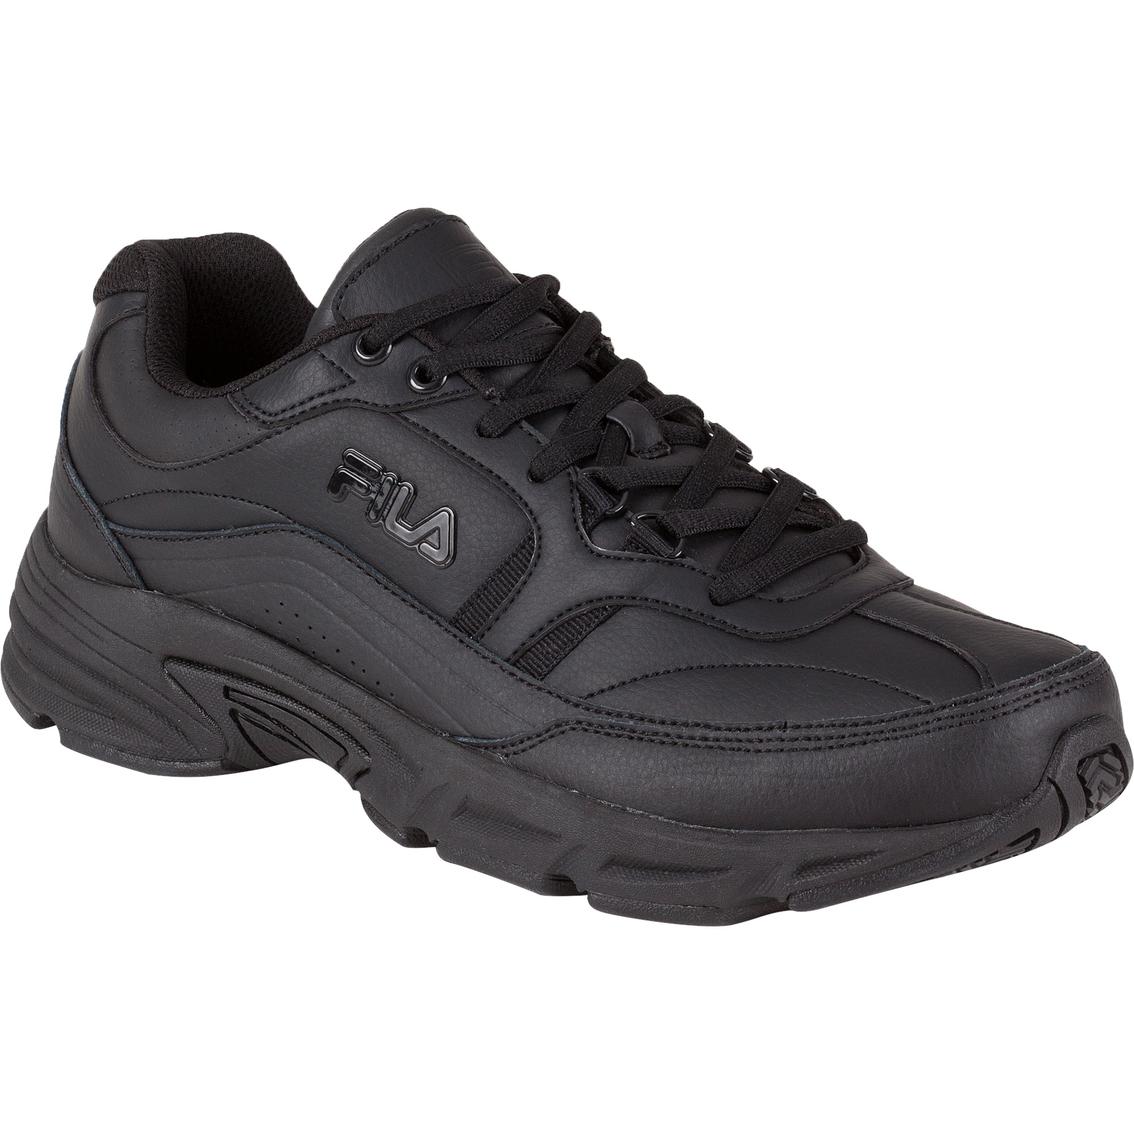 Fila Men's Memory Workshift Shoes